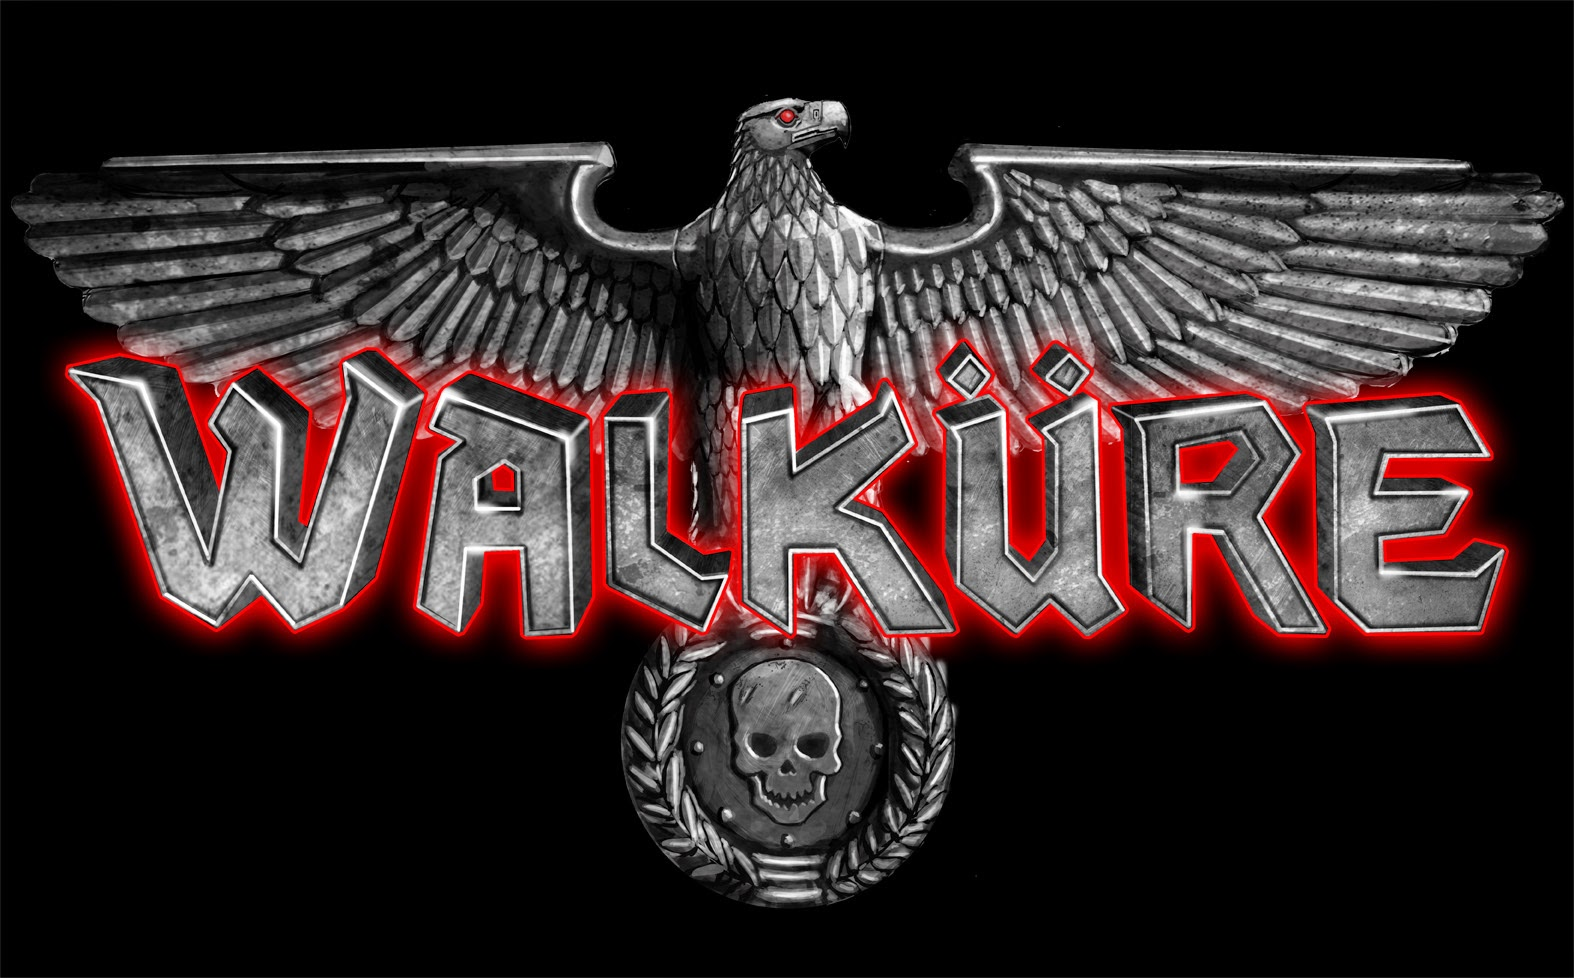 www,walkure.es